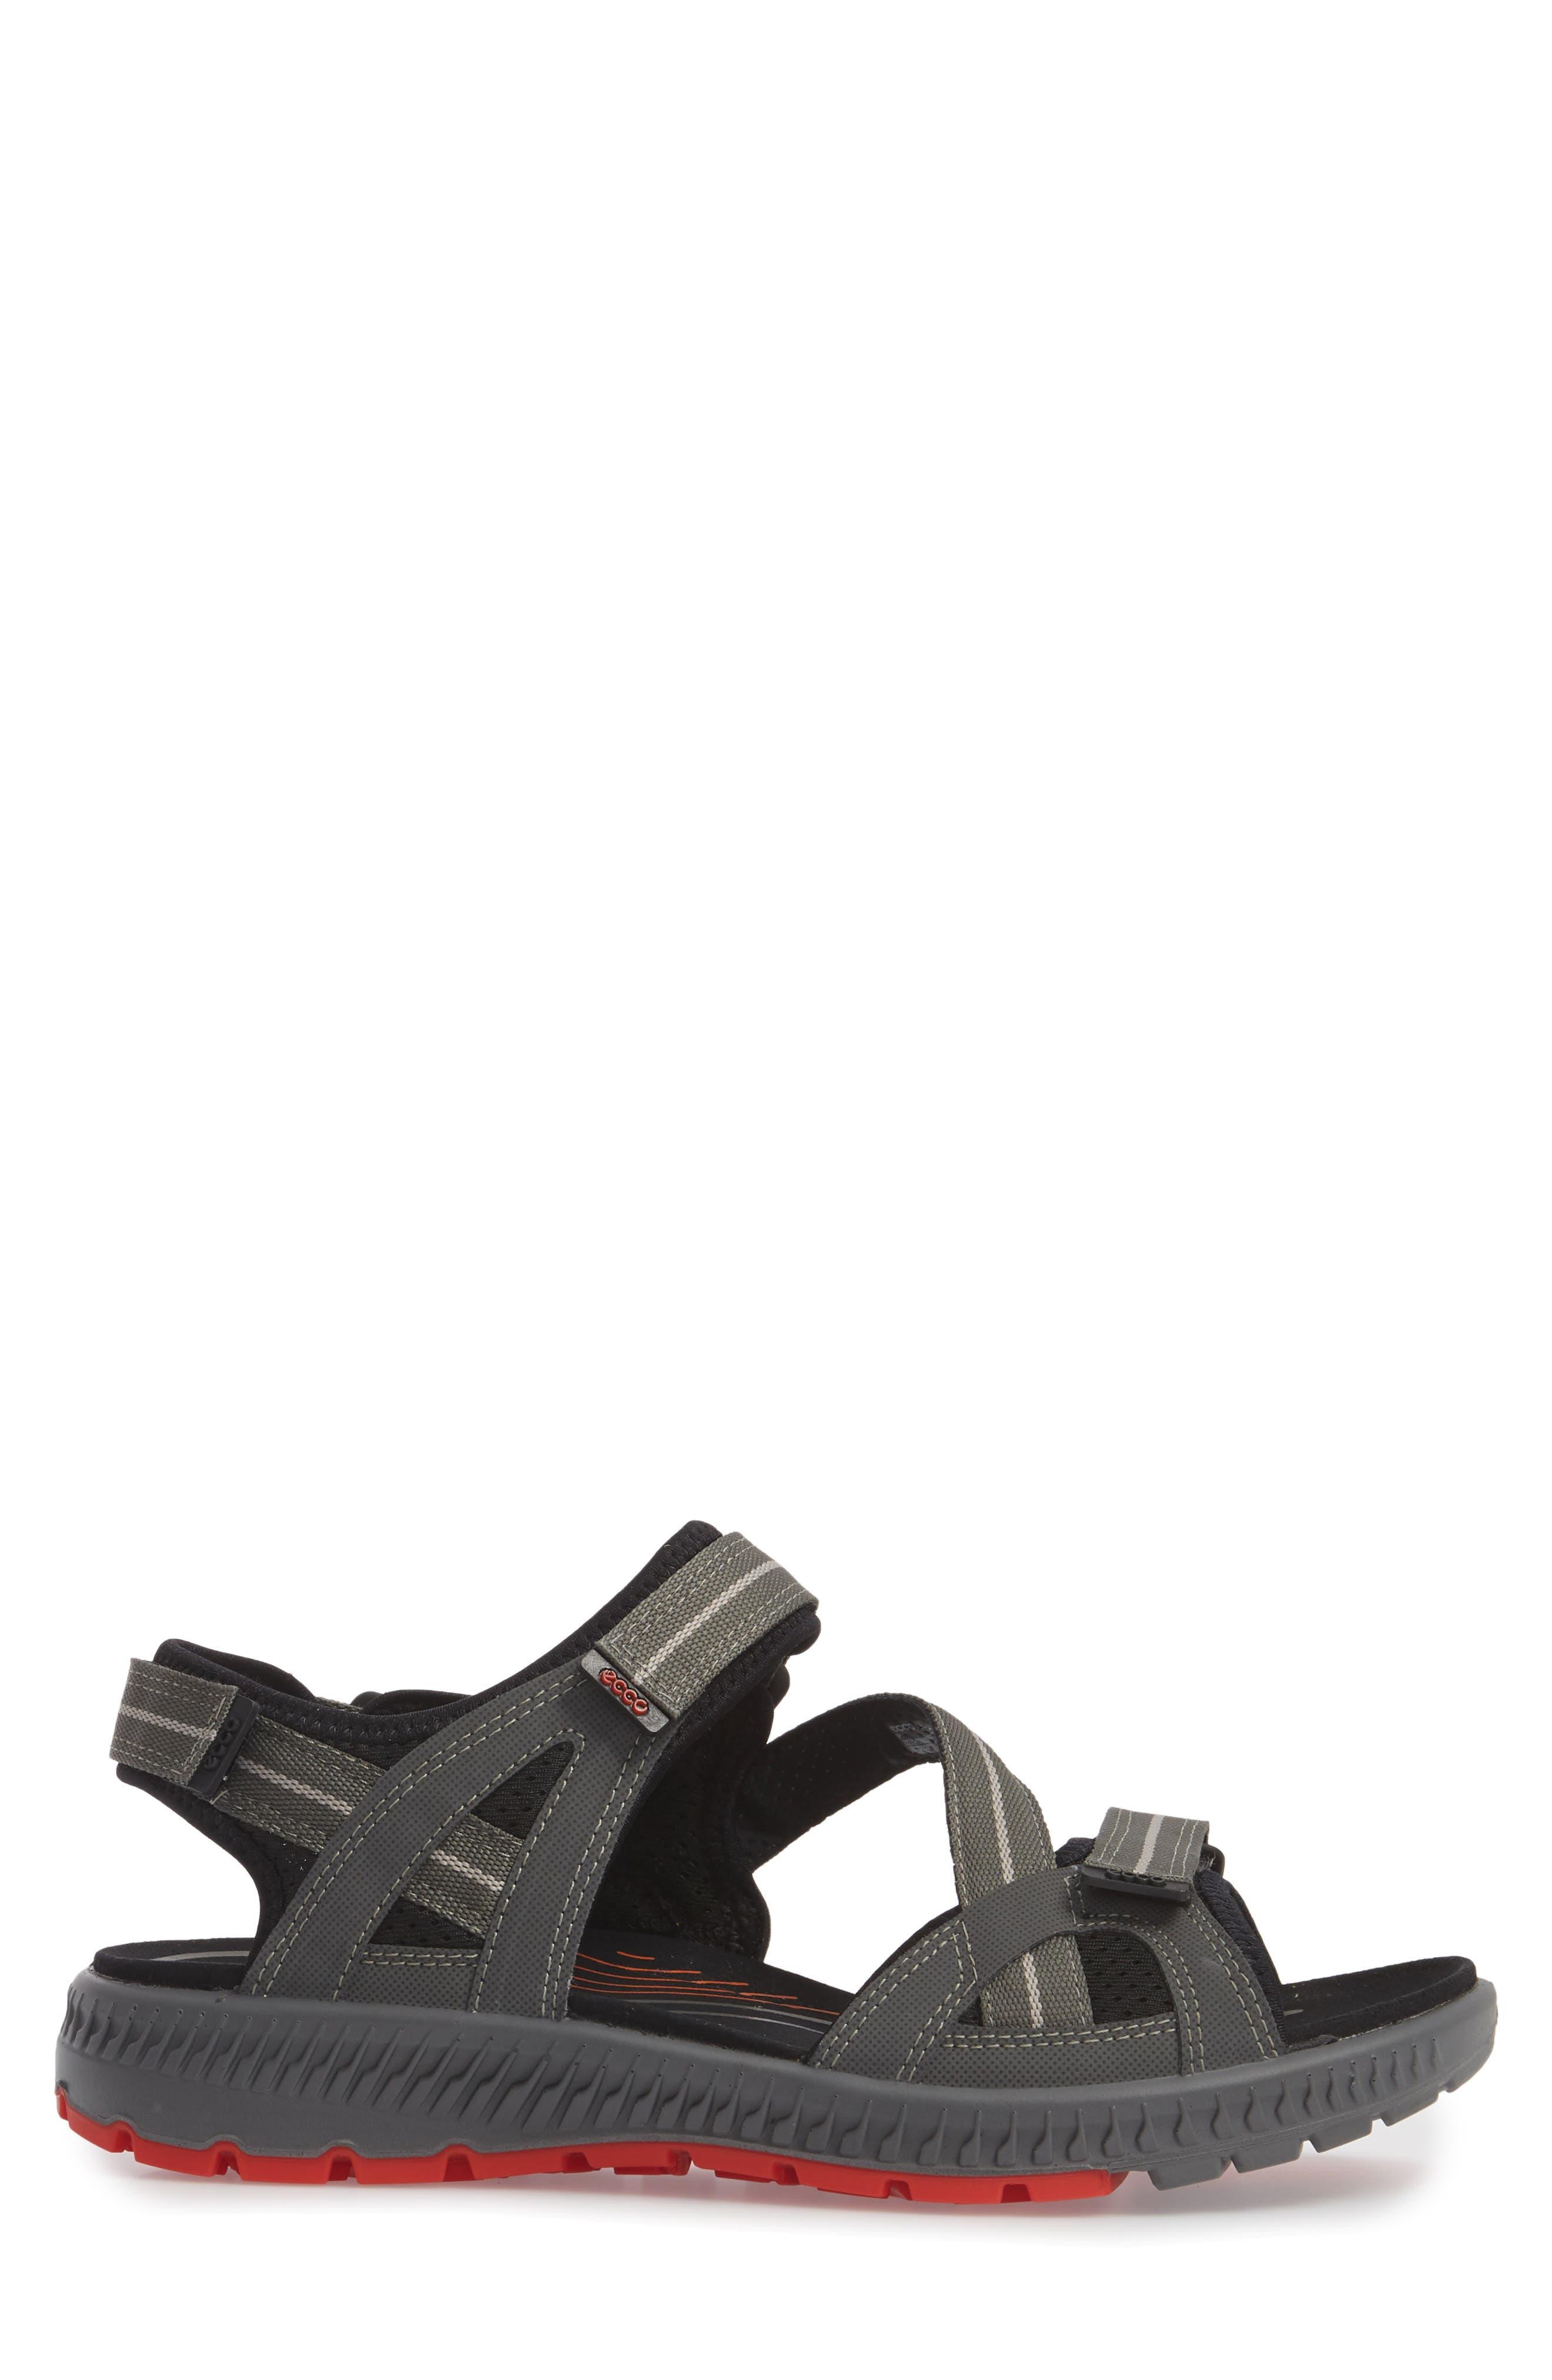 Terra Sandal,                             Alternate thumbnail 3, color,                             Dark Shadow Leather